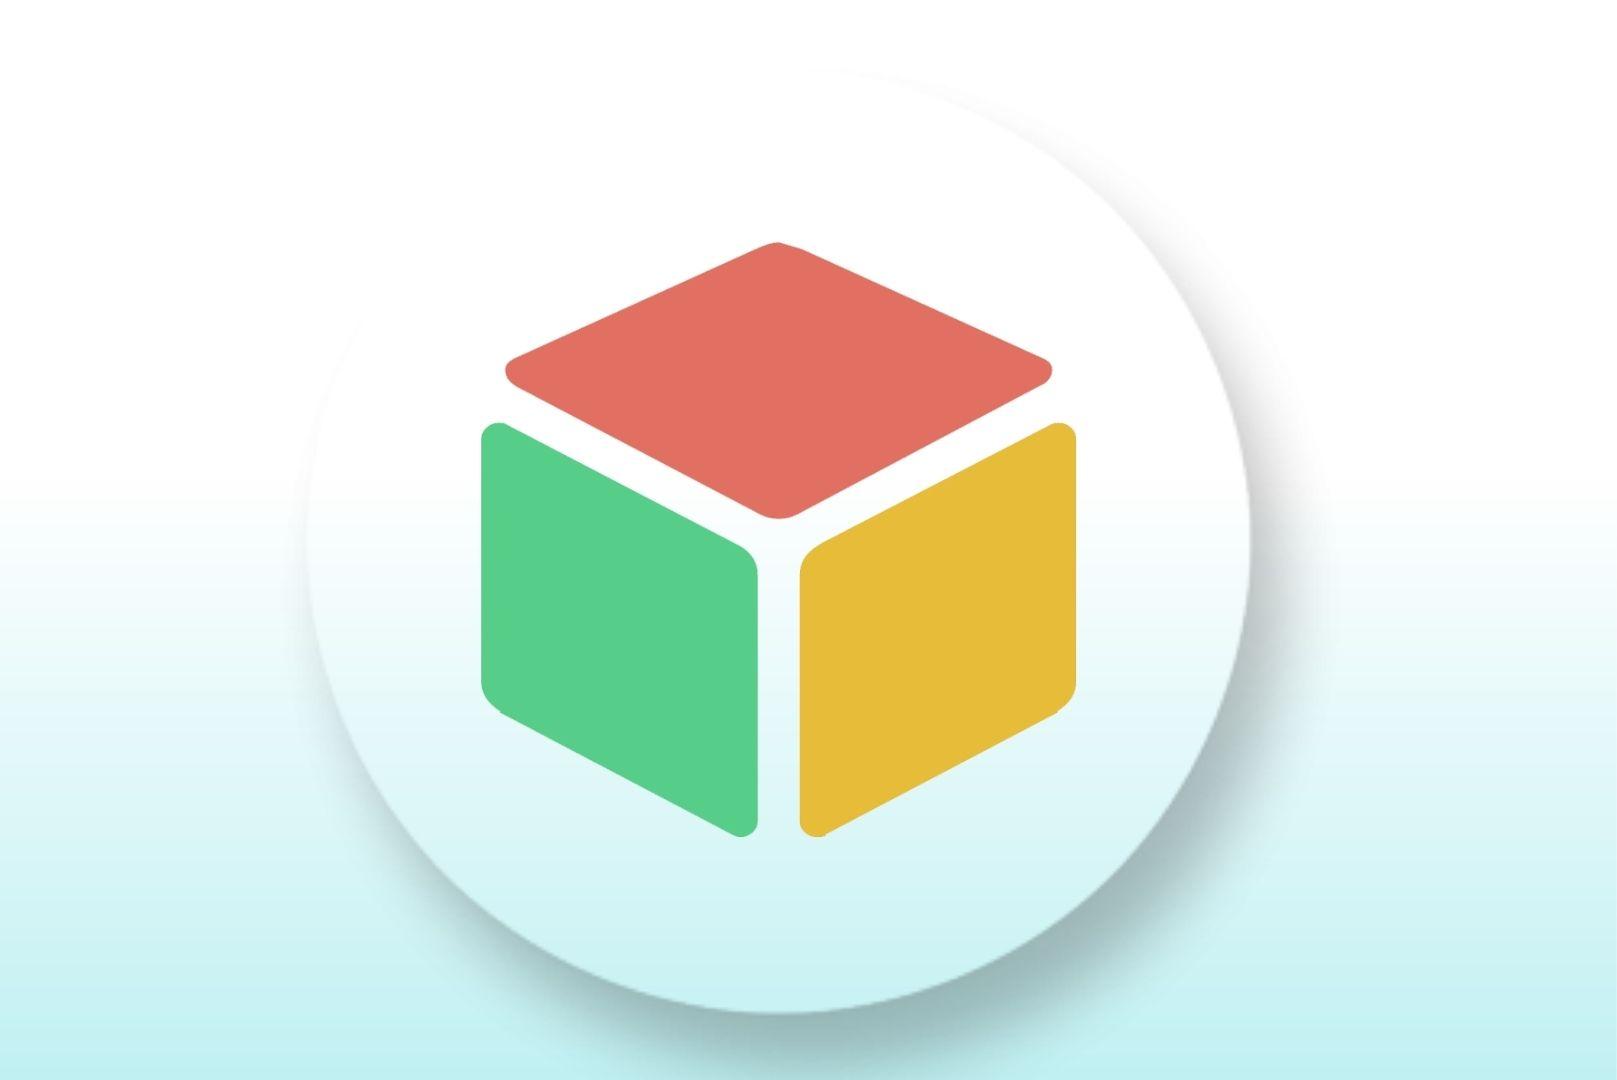 Appetize flutter app development tools